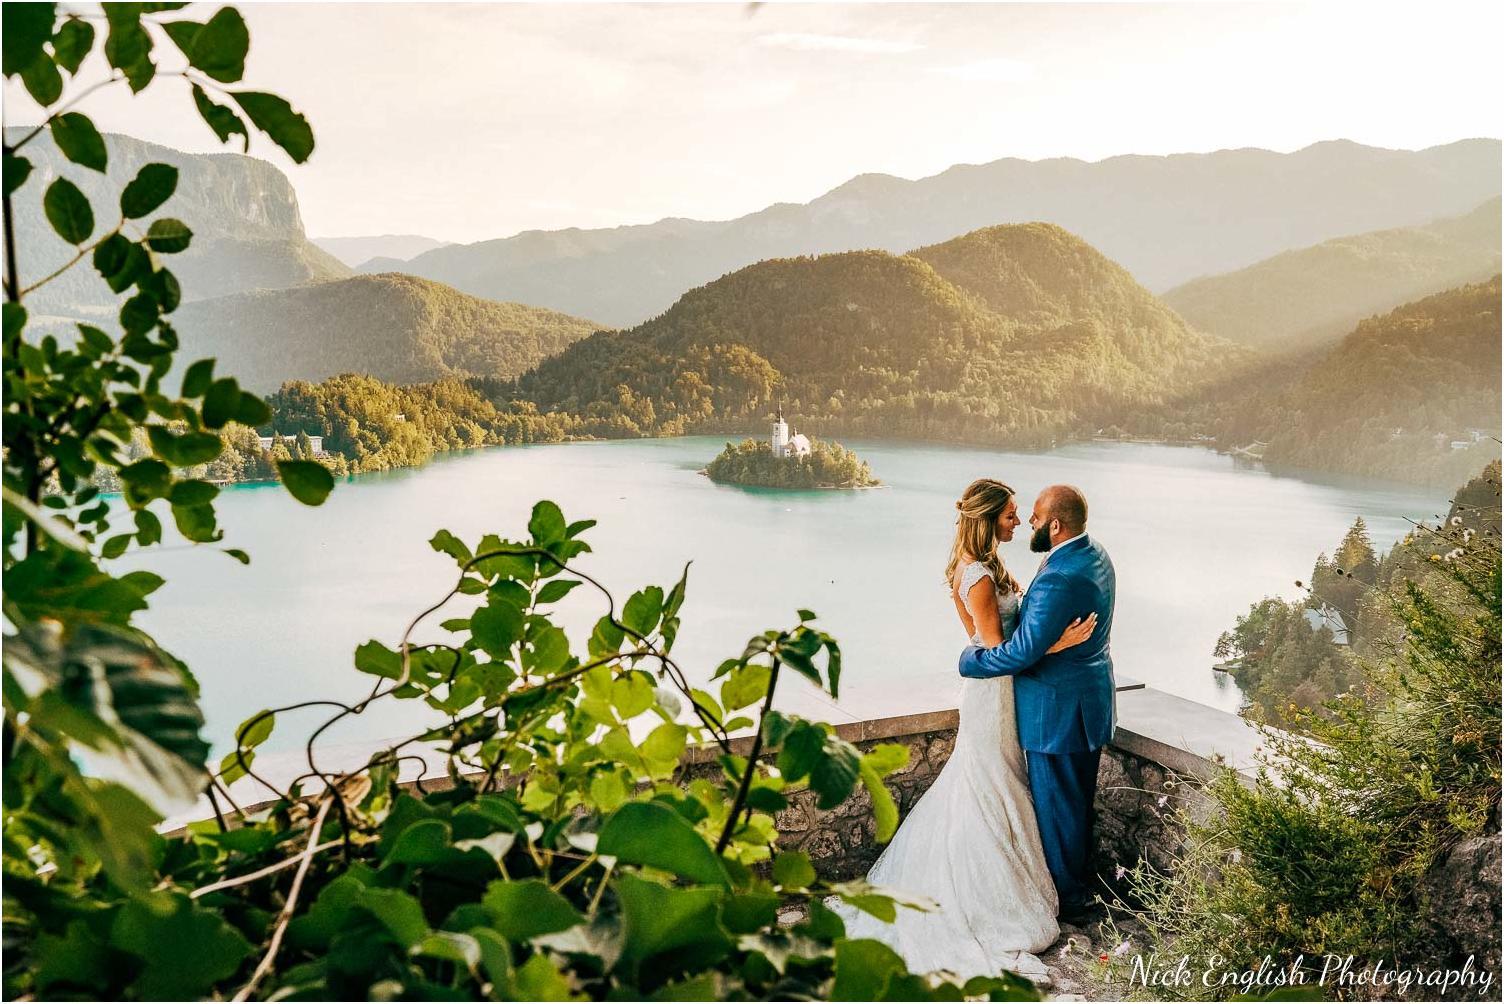 Destination_Wedding_Photographer_Slovenia_Nick_English_Photography-70-30.jpg